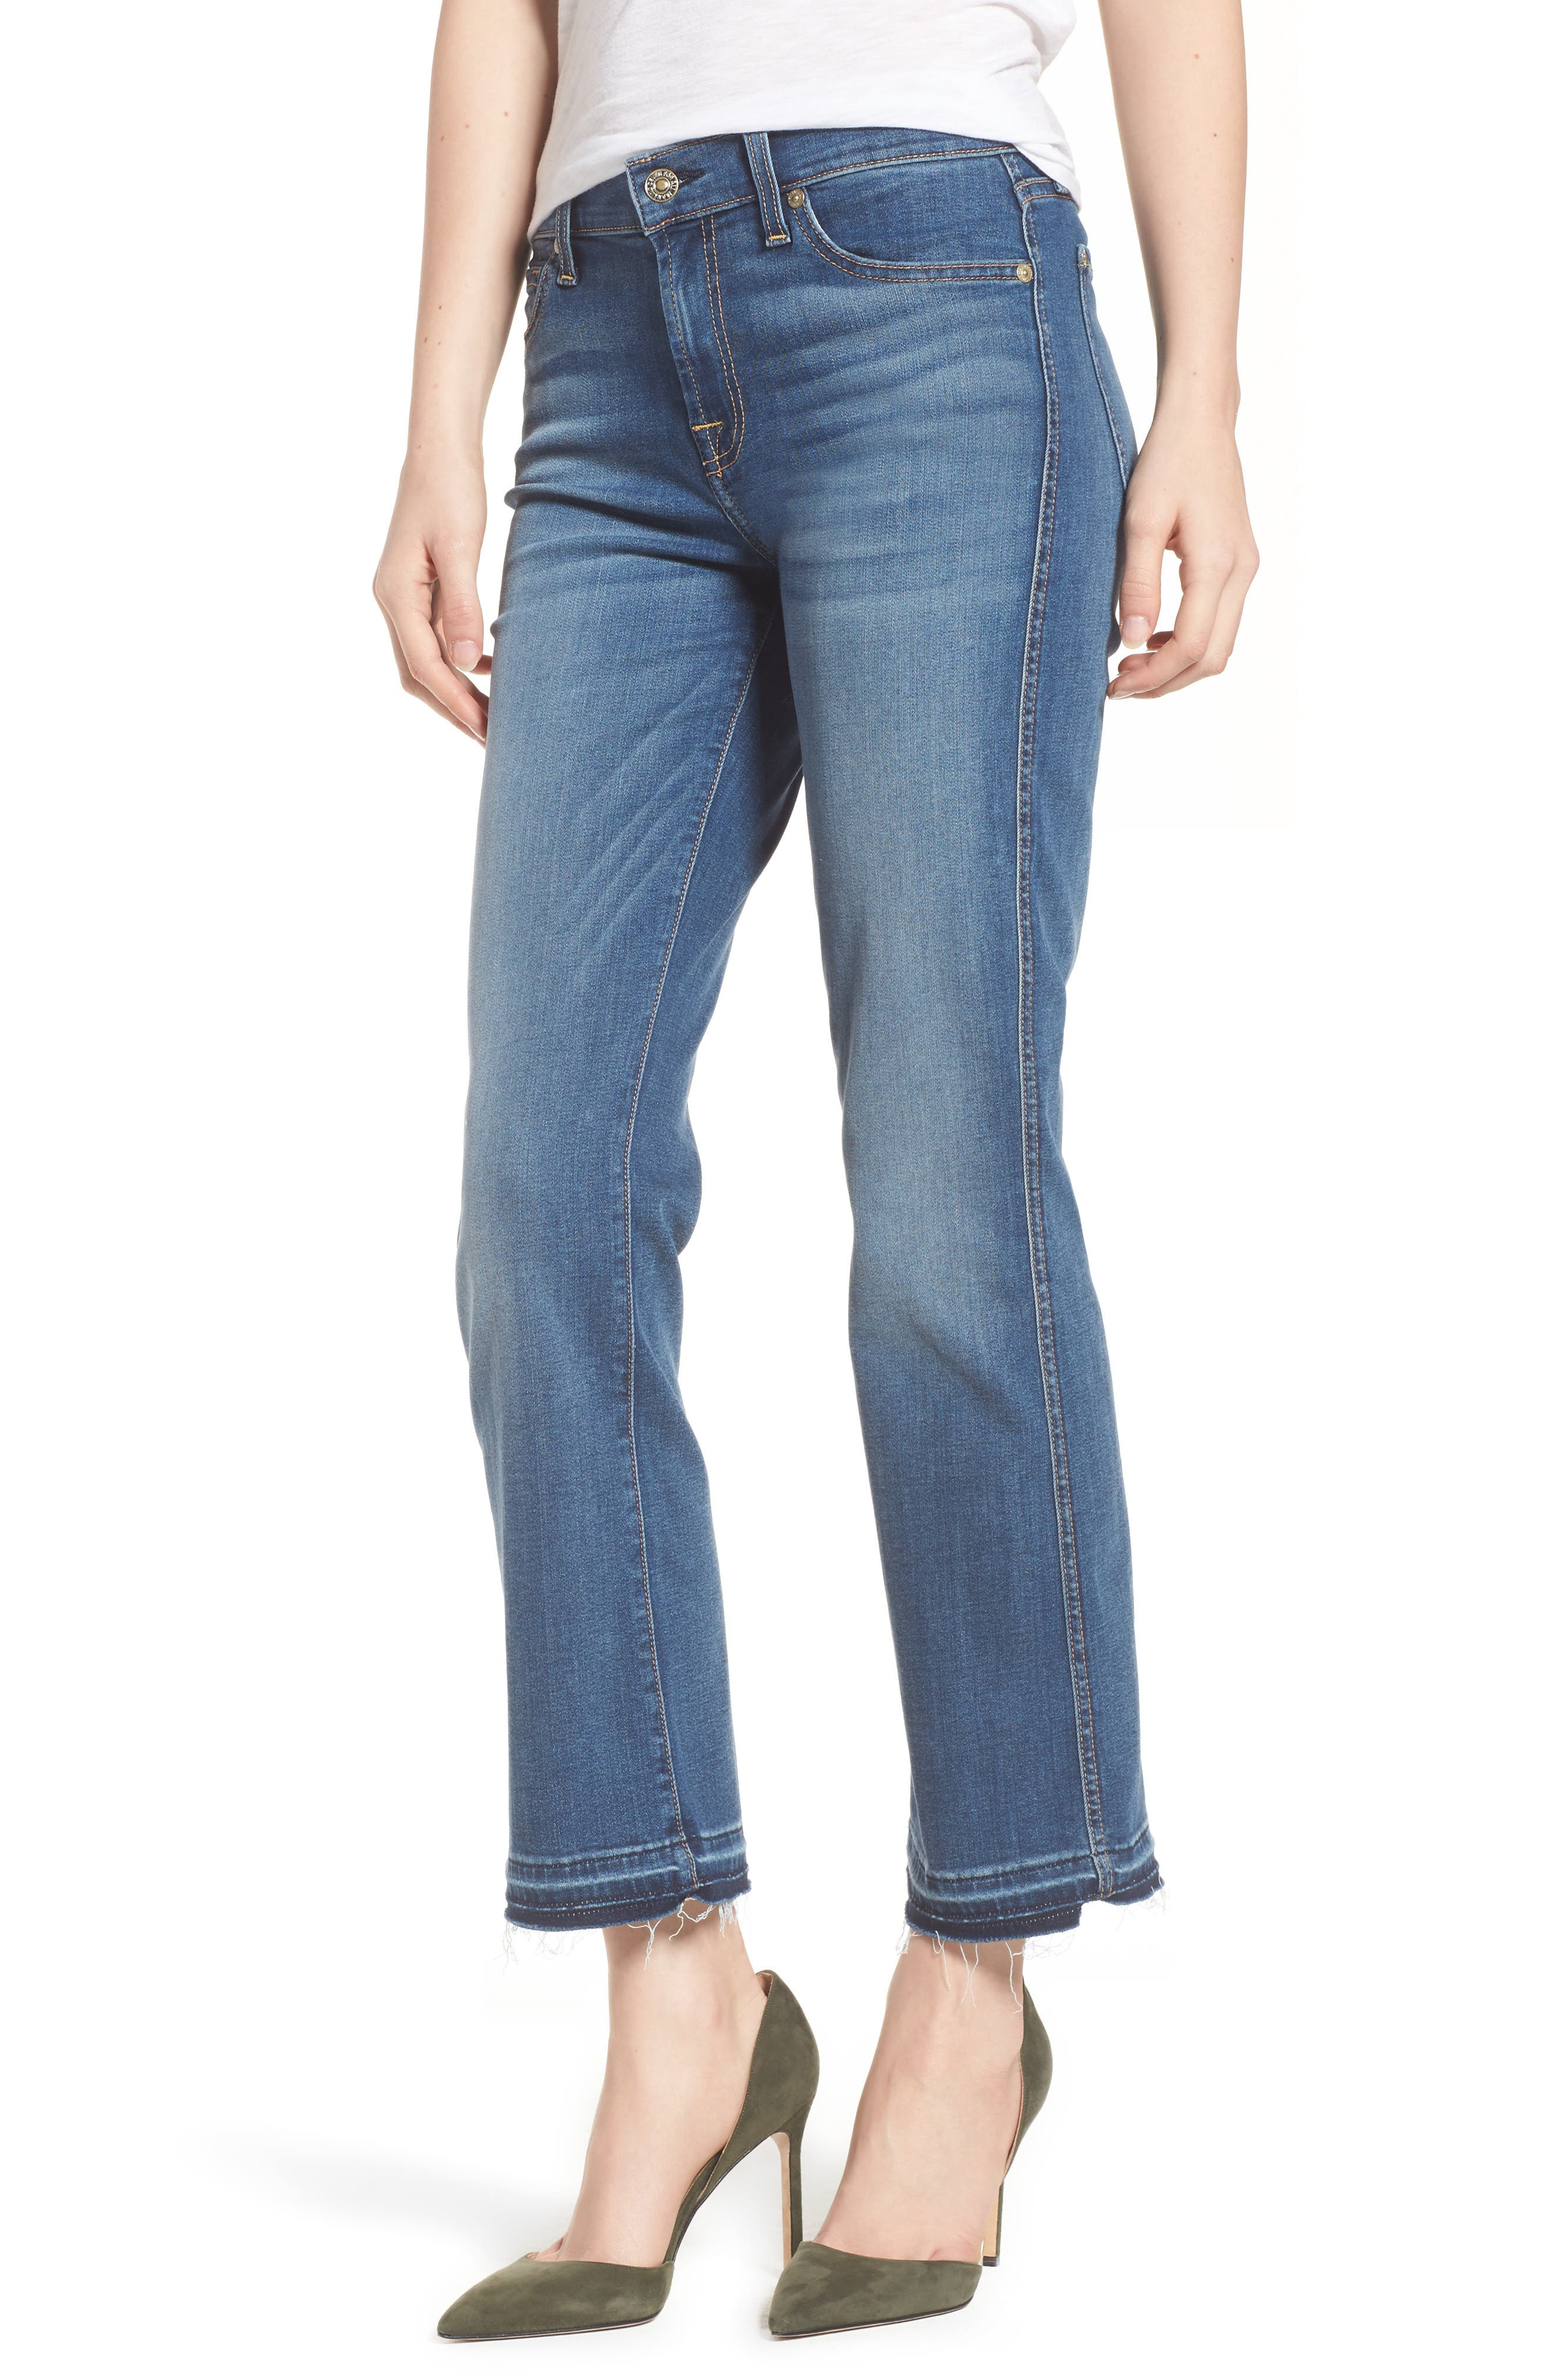 b(air) Crop Bootcut Jeans,                         Main,                         color, BAIR VINTAGE DUSK